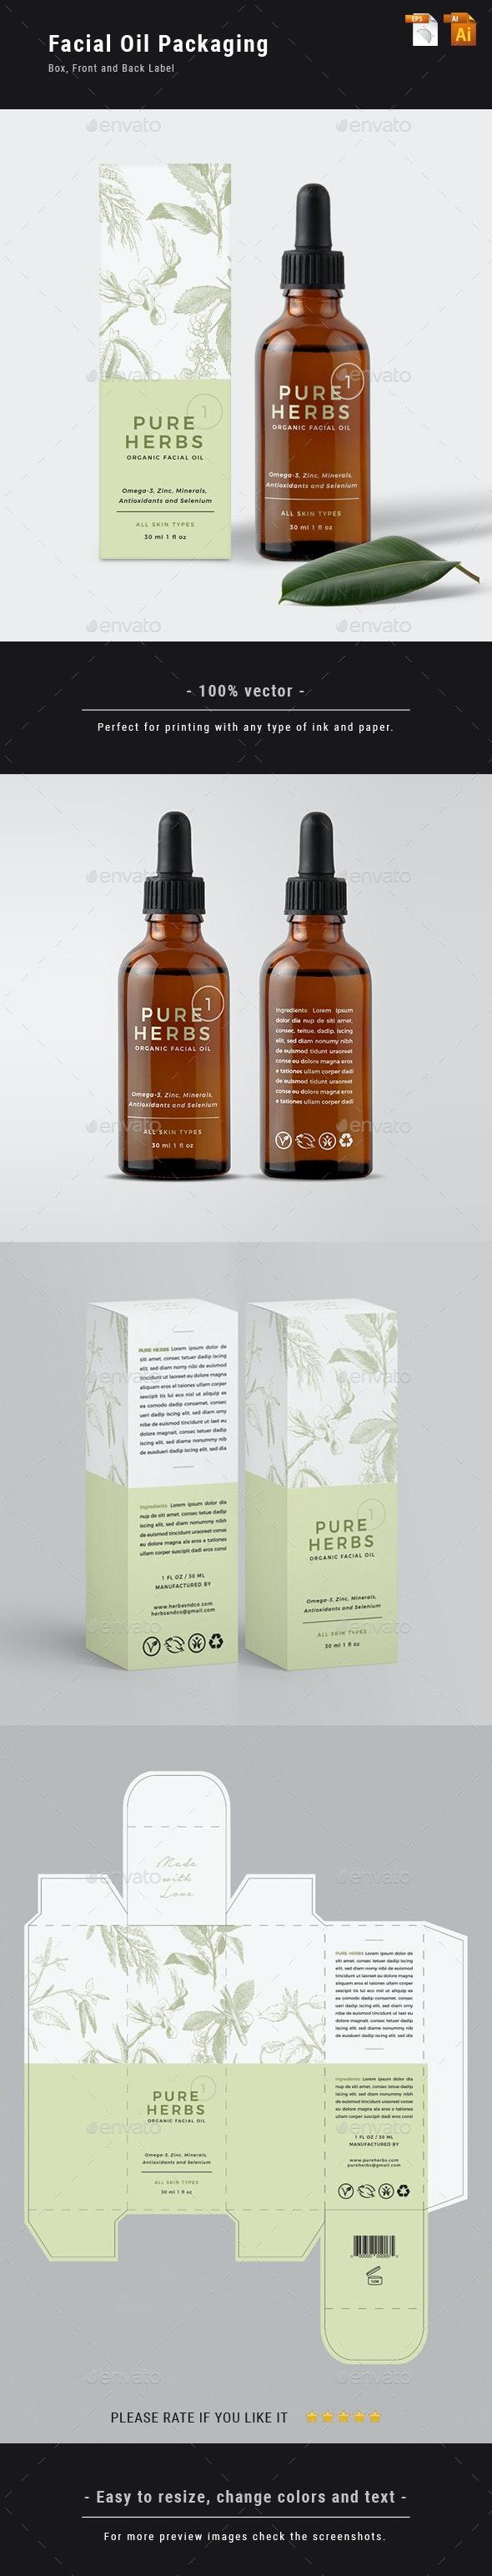 Organic Facial Oil Packaging - Packaging Print Templates